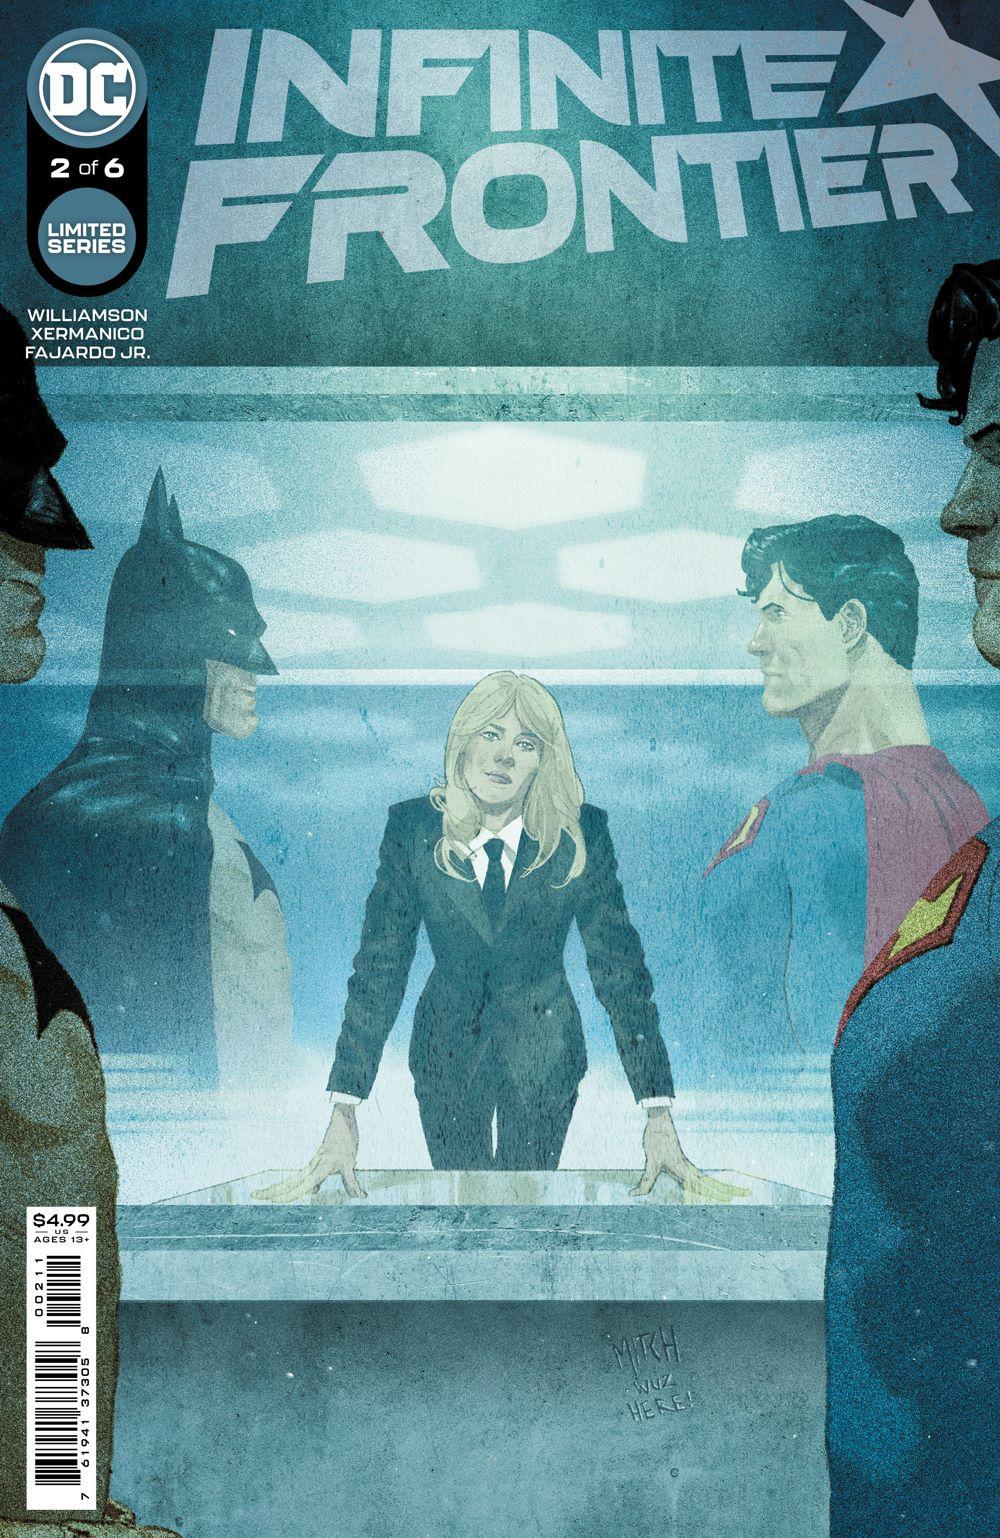 INFINITE_FRONTIER_Cv2 DC Comics July 2021 Solicitations